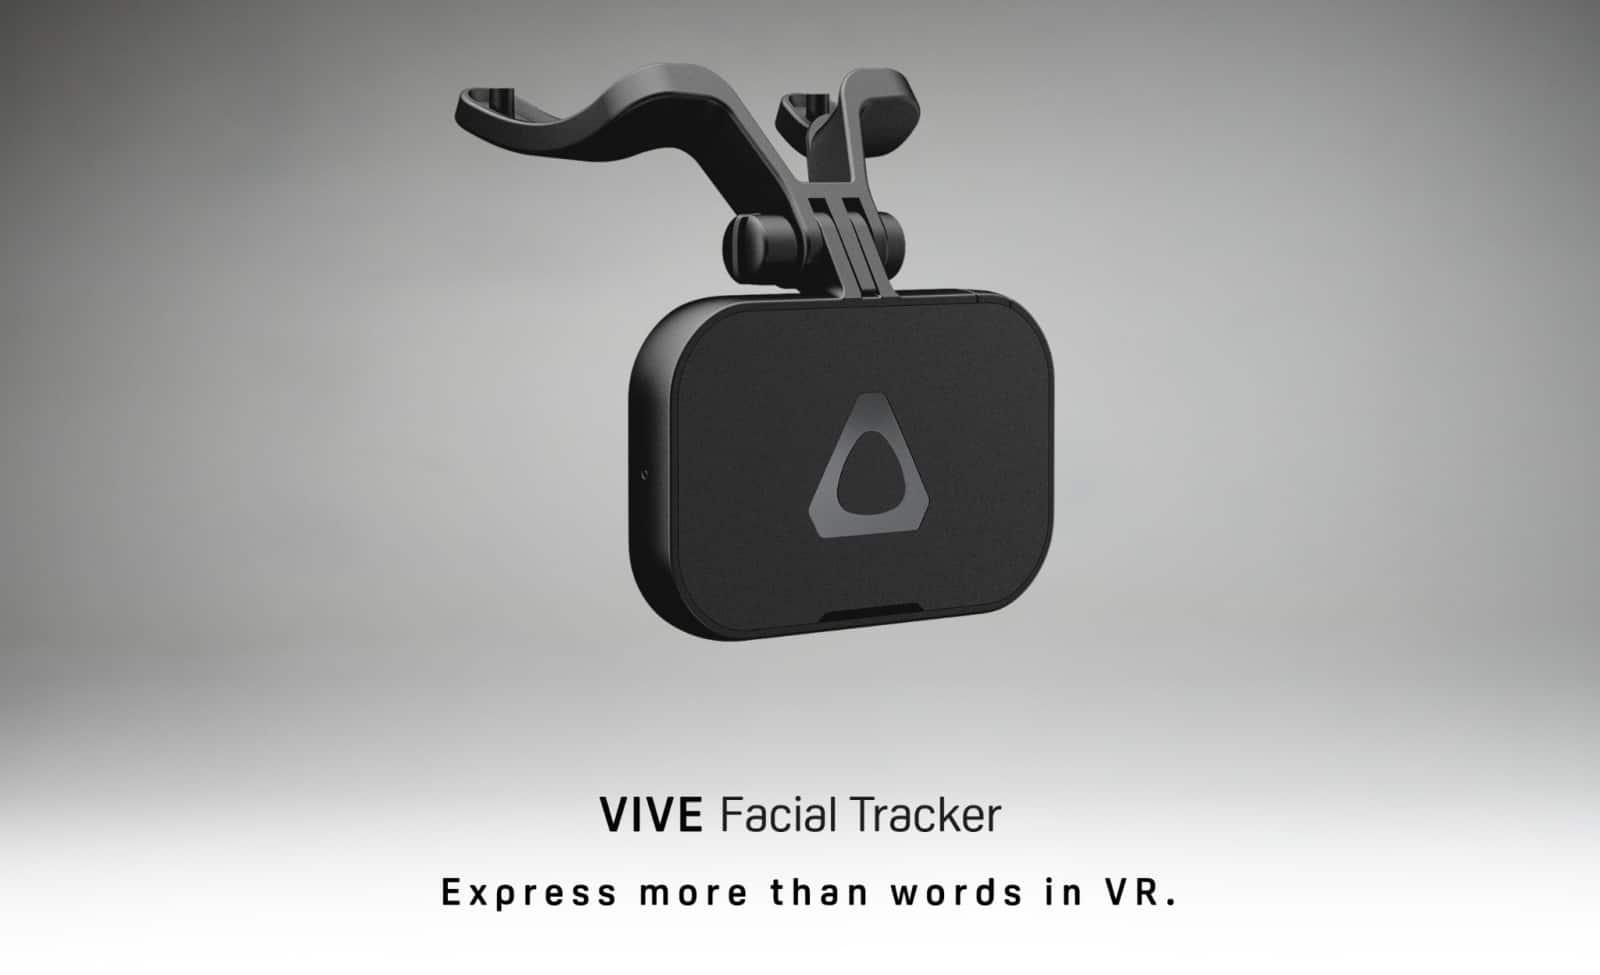 HTC VIVE Facial Tracker device